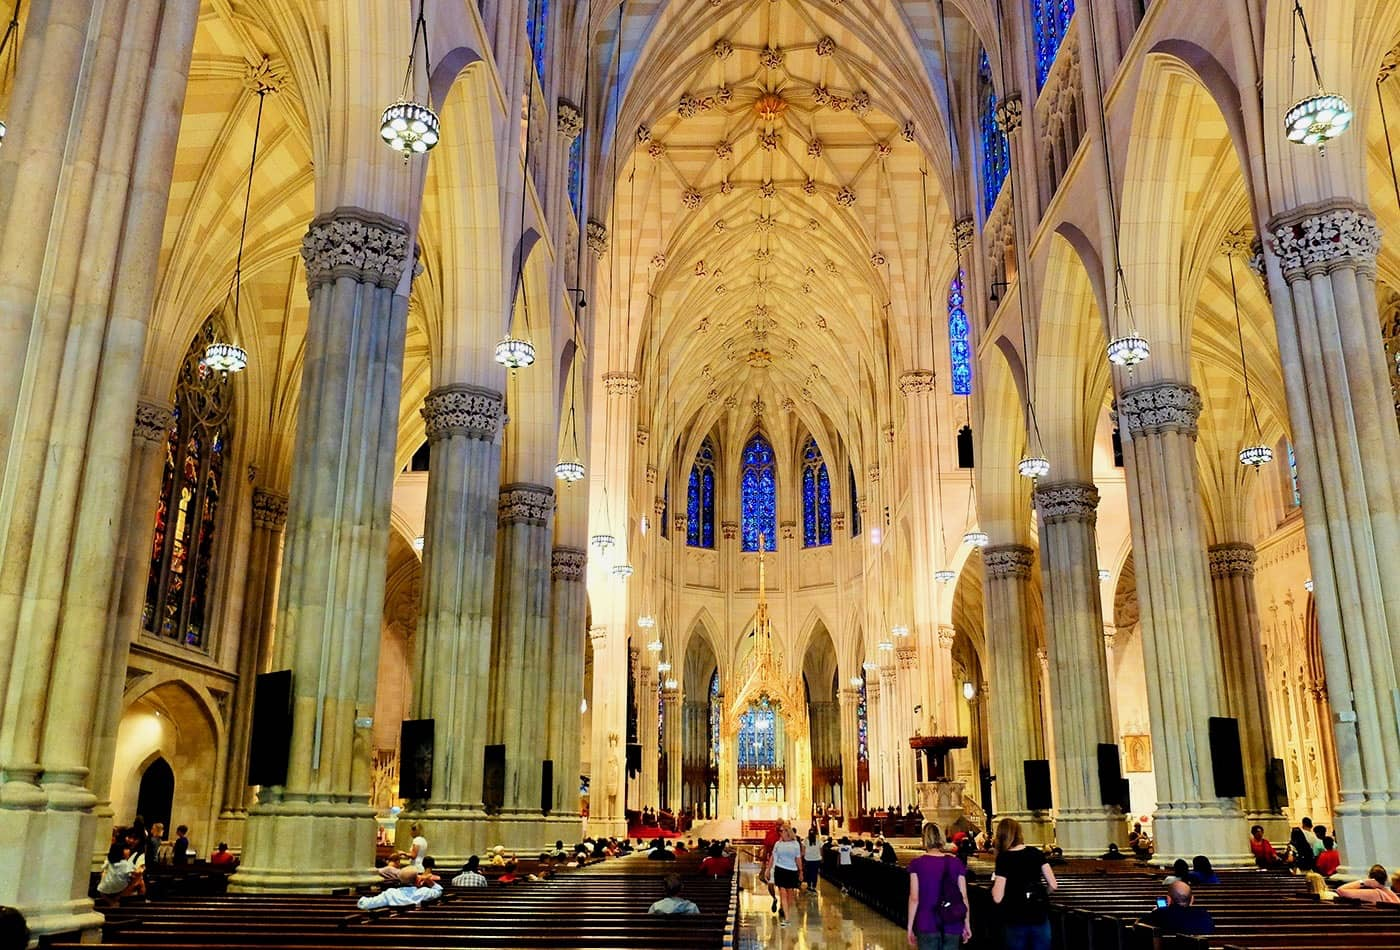 St. Patrick's Cathedral i New York - Imponerende arkitektur